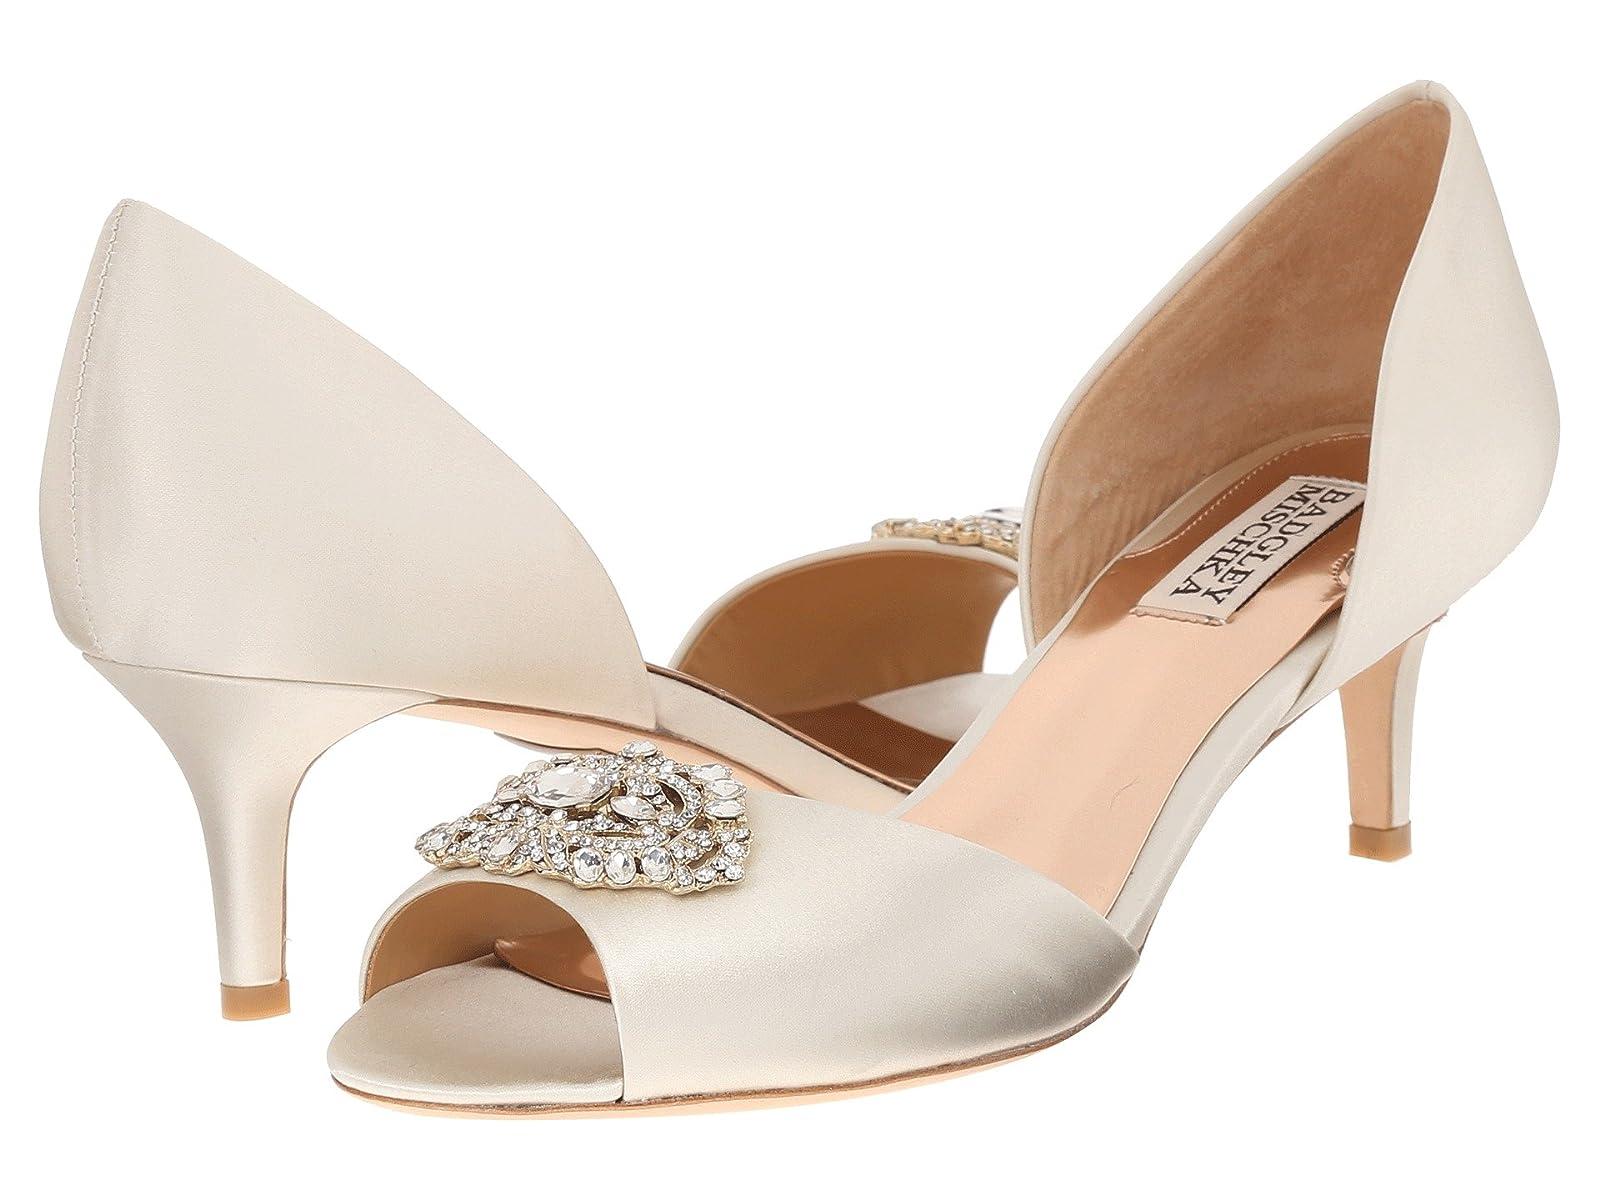 Badgley Mischka PetrinaCheap and distinctive eye-catching shoes